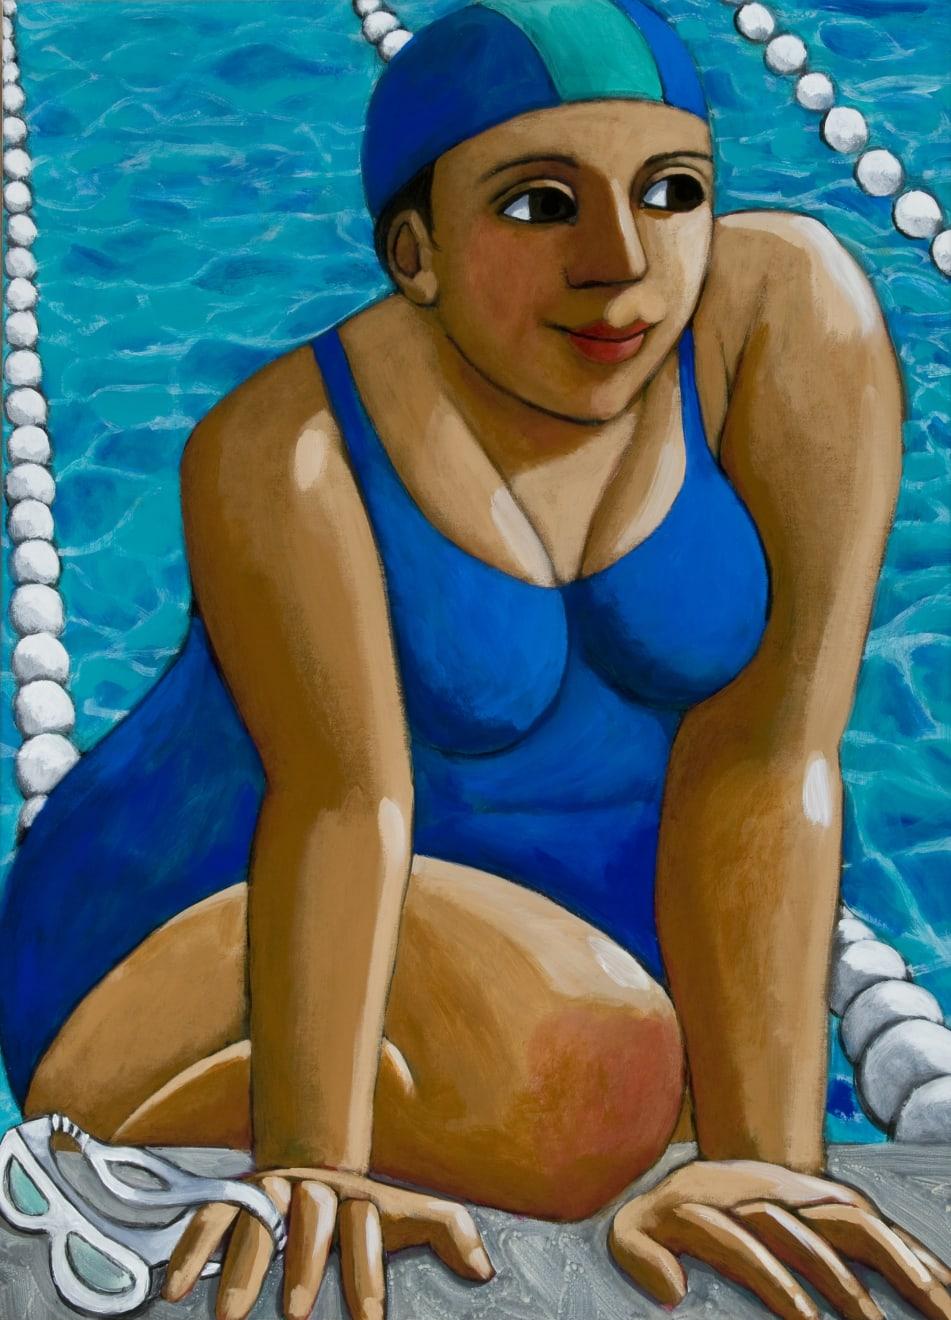 Anita Klein, Dopo Nuotare (After Swimming), 2019